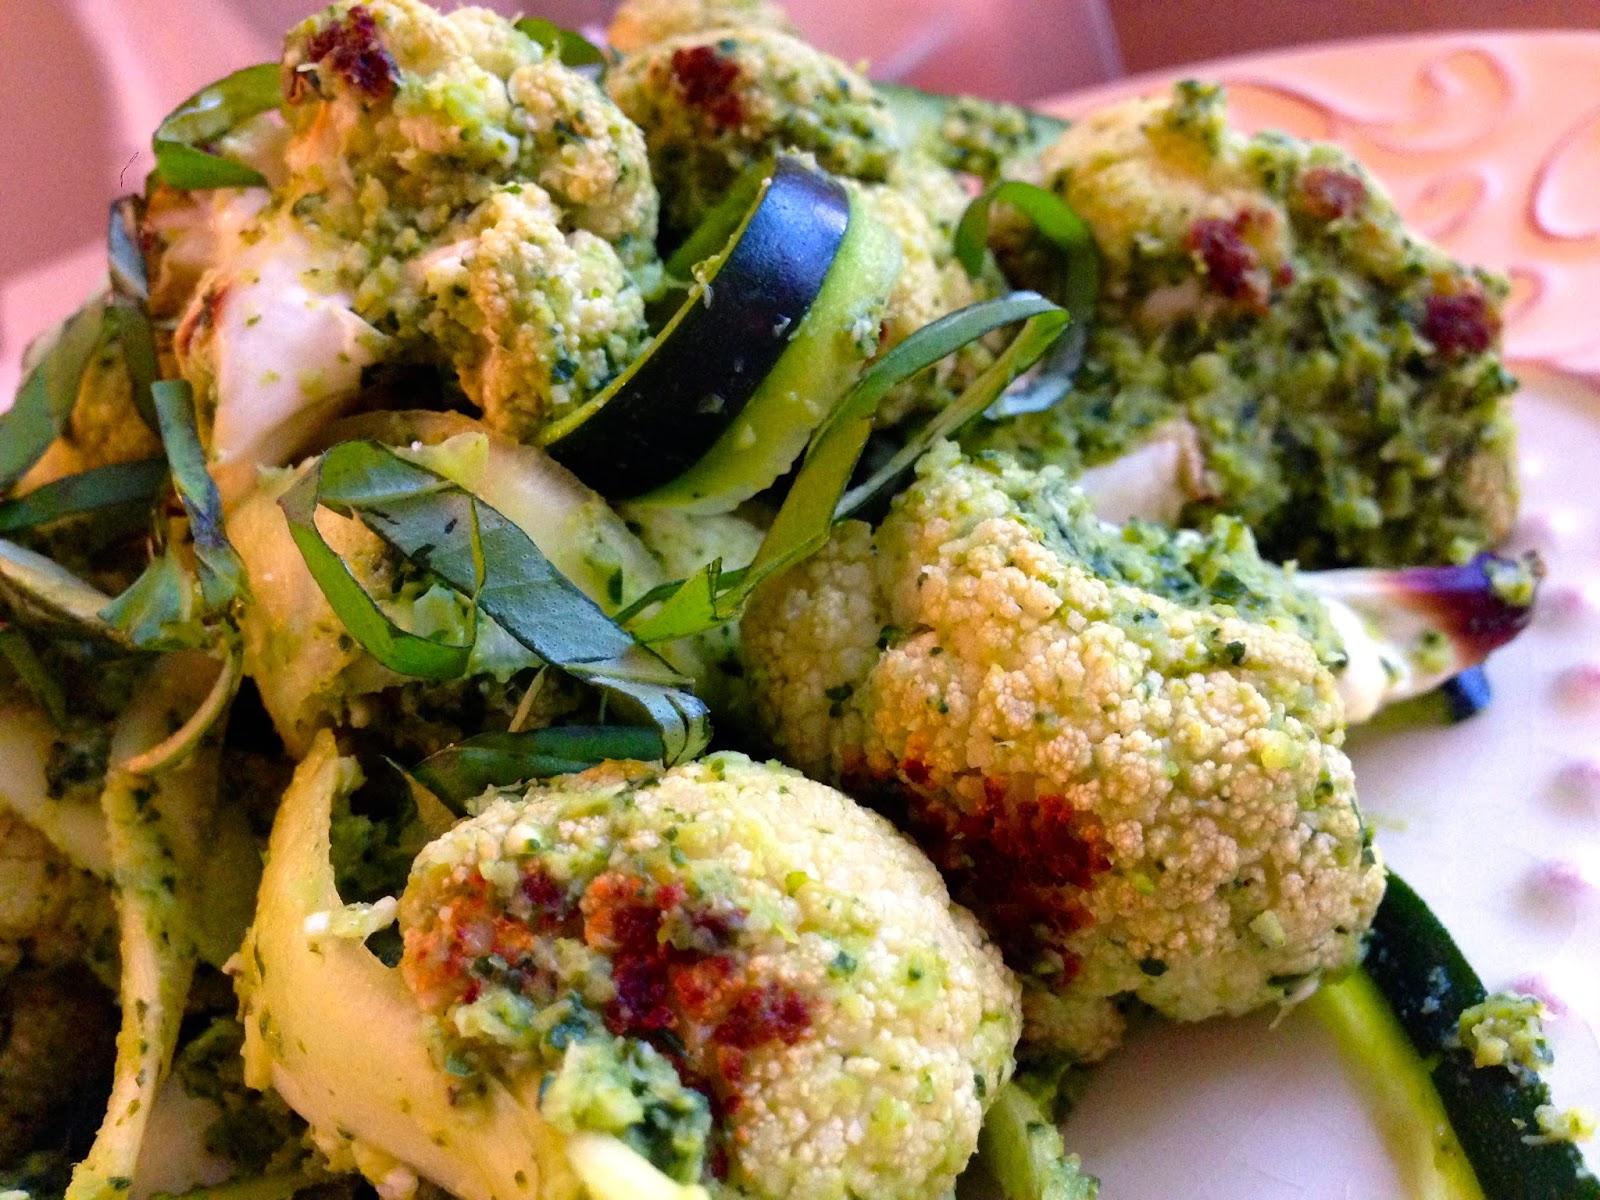 Kale Pesto Pasta #glutenfree #vegan #paleo #specificcarbohydratediet #edrecovery #beautybeyondbones #food